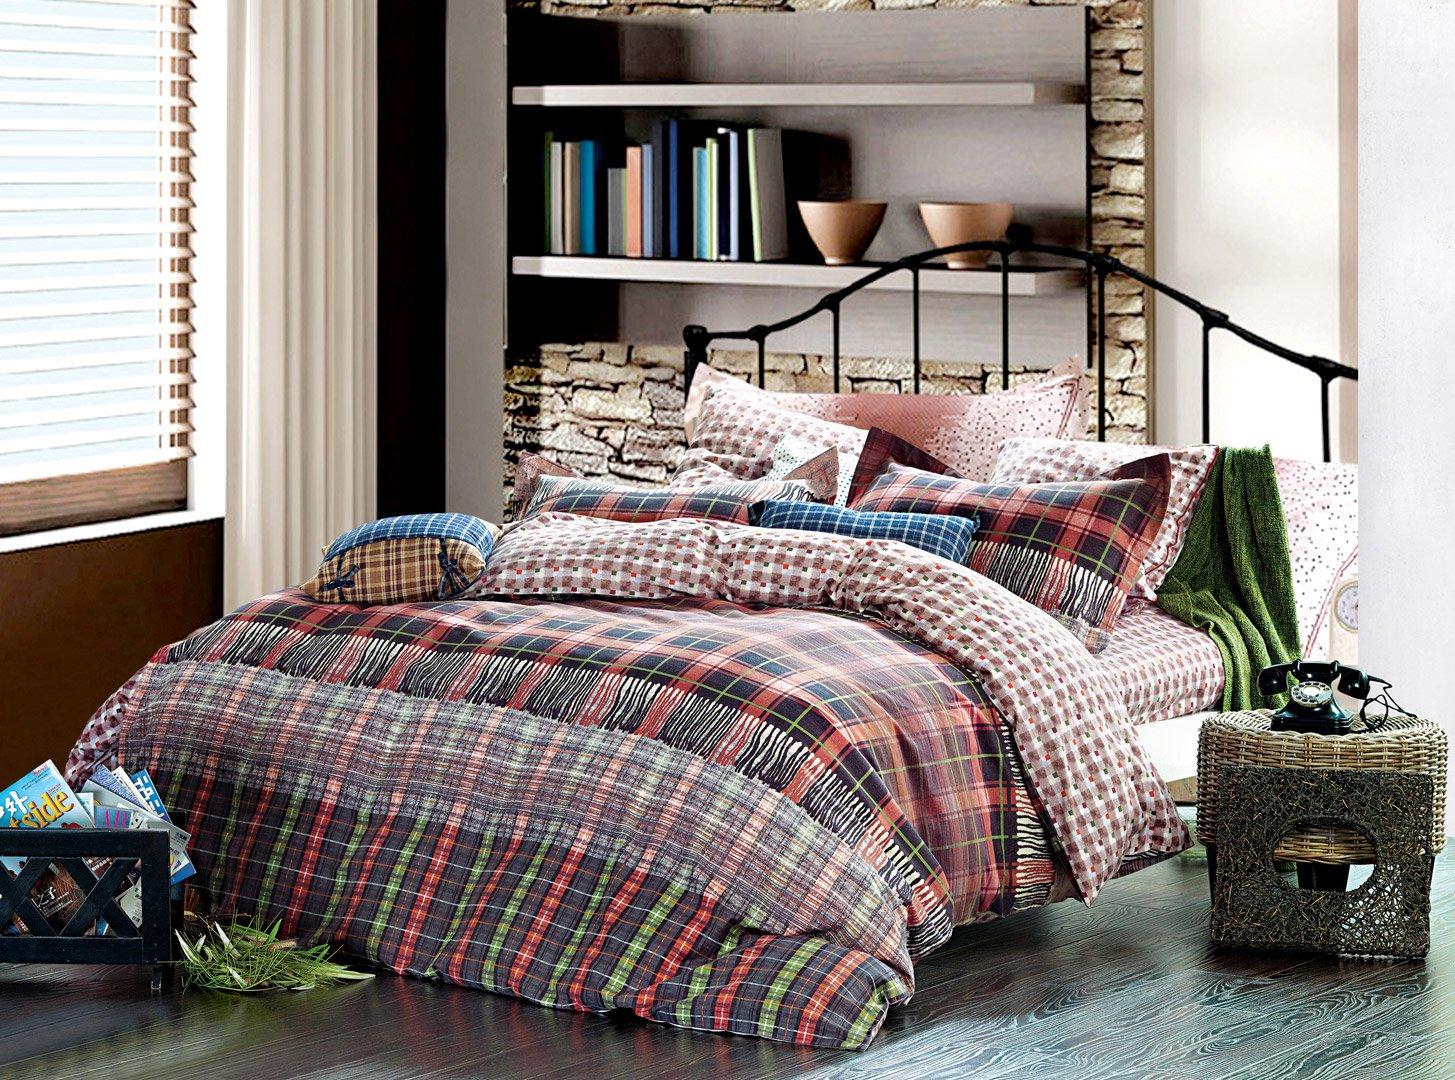 title | Luxury Masculine Bedding